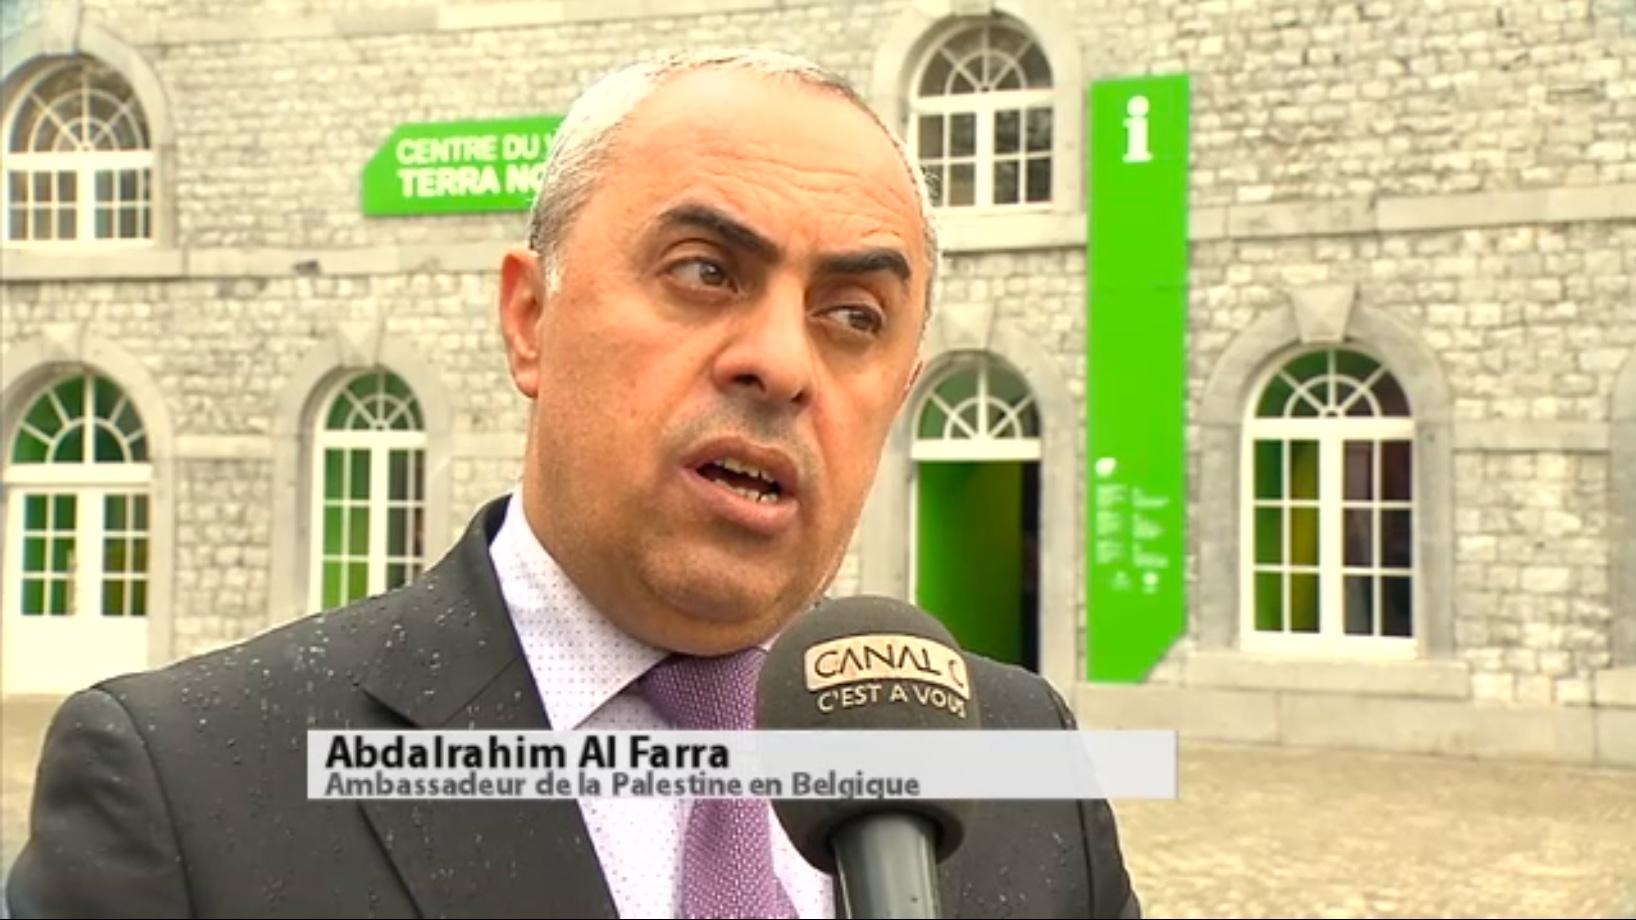 Ambassadeur palestinien en Belgique